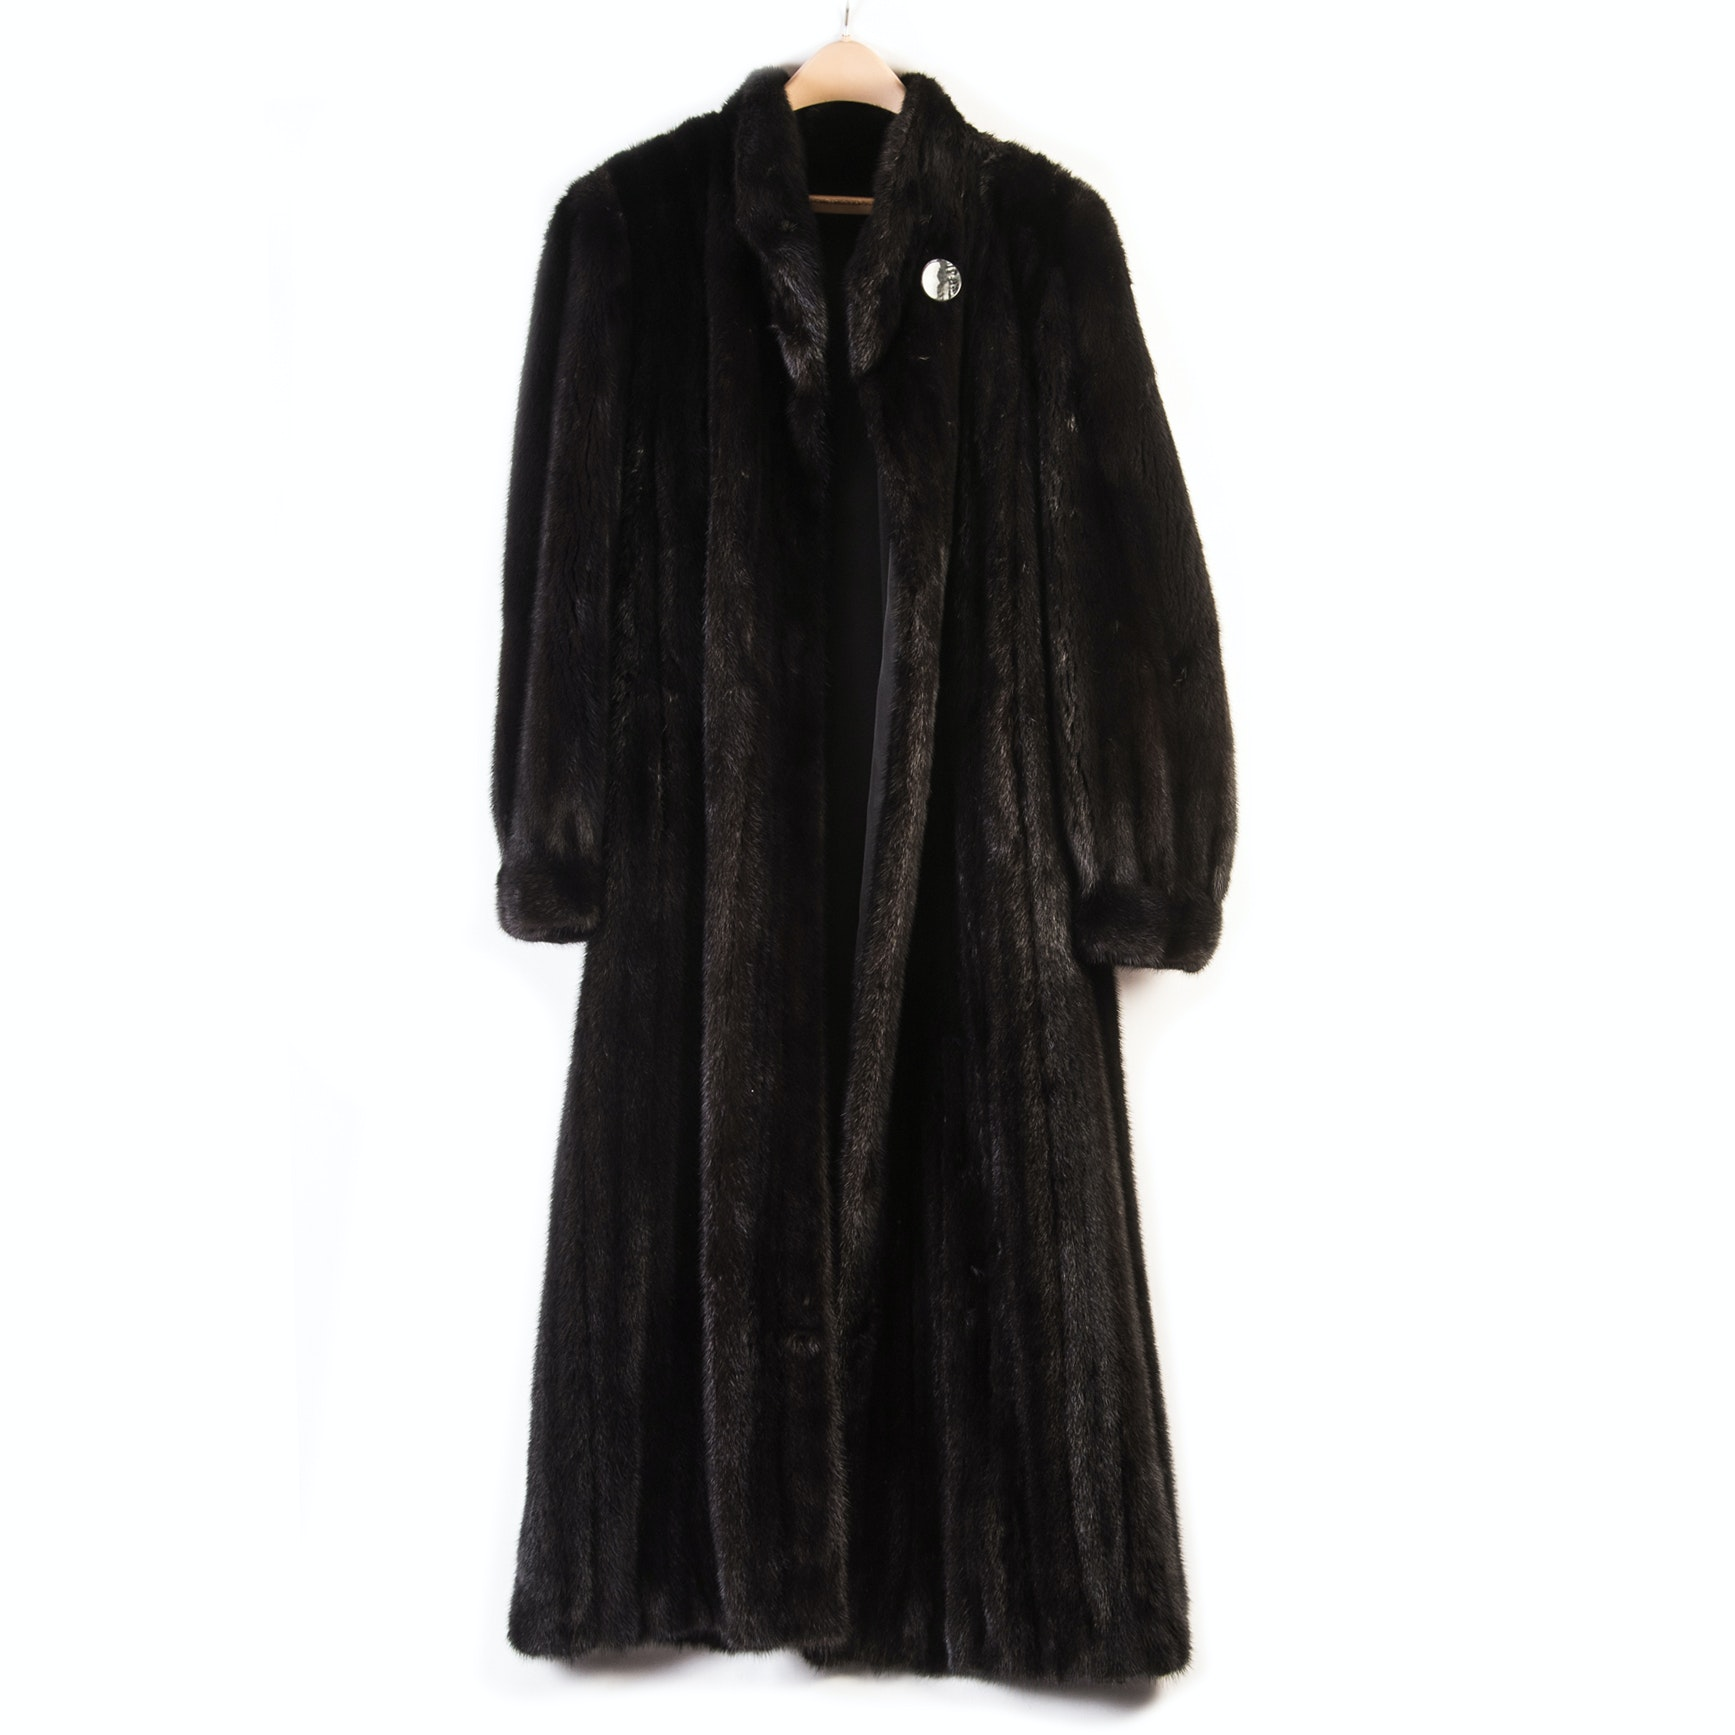 Full-Length Mink Fur Coat